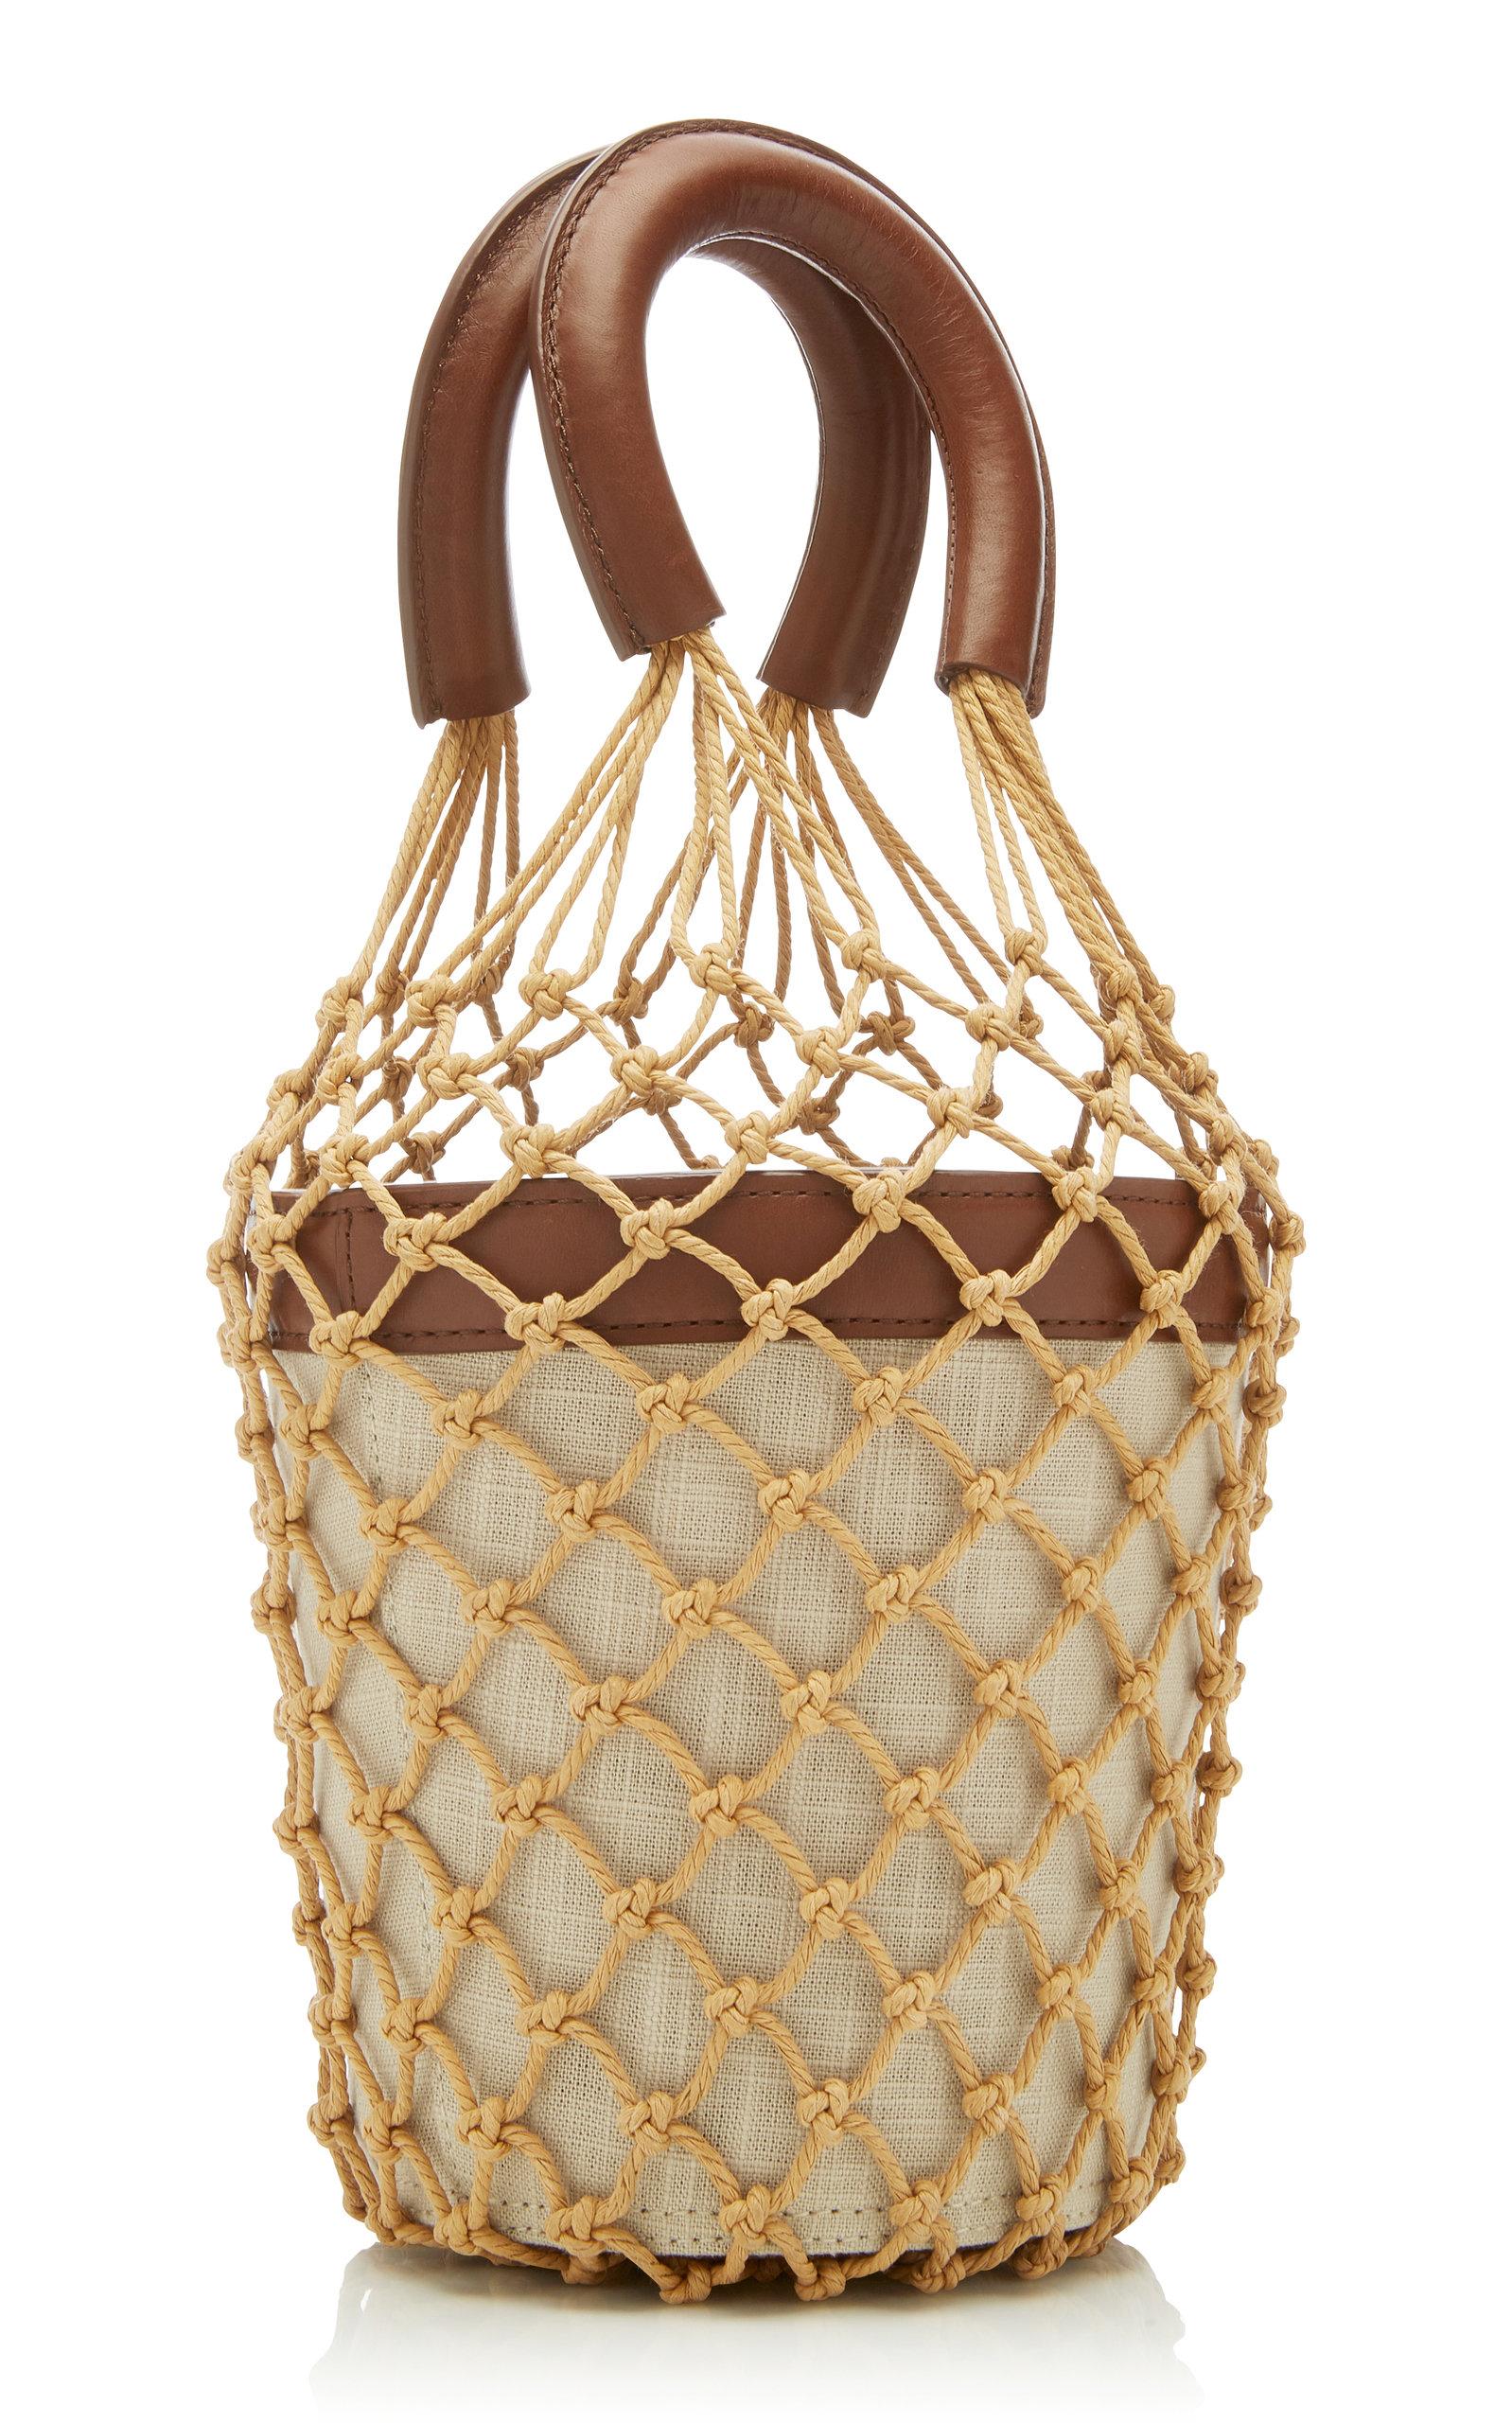 8196027d1 StaudMoreau Macramé Leather Bag. CLOSE. Loading. Loading